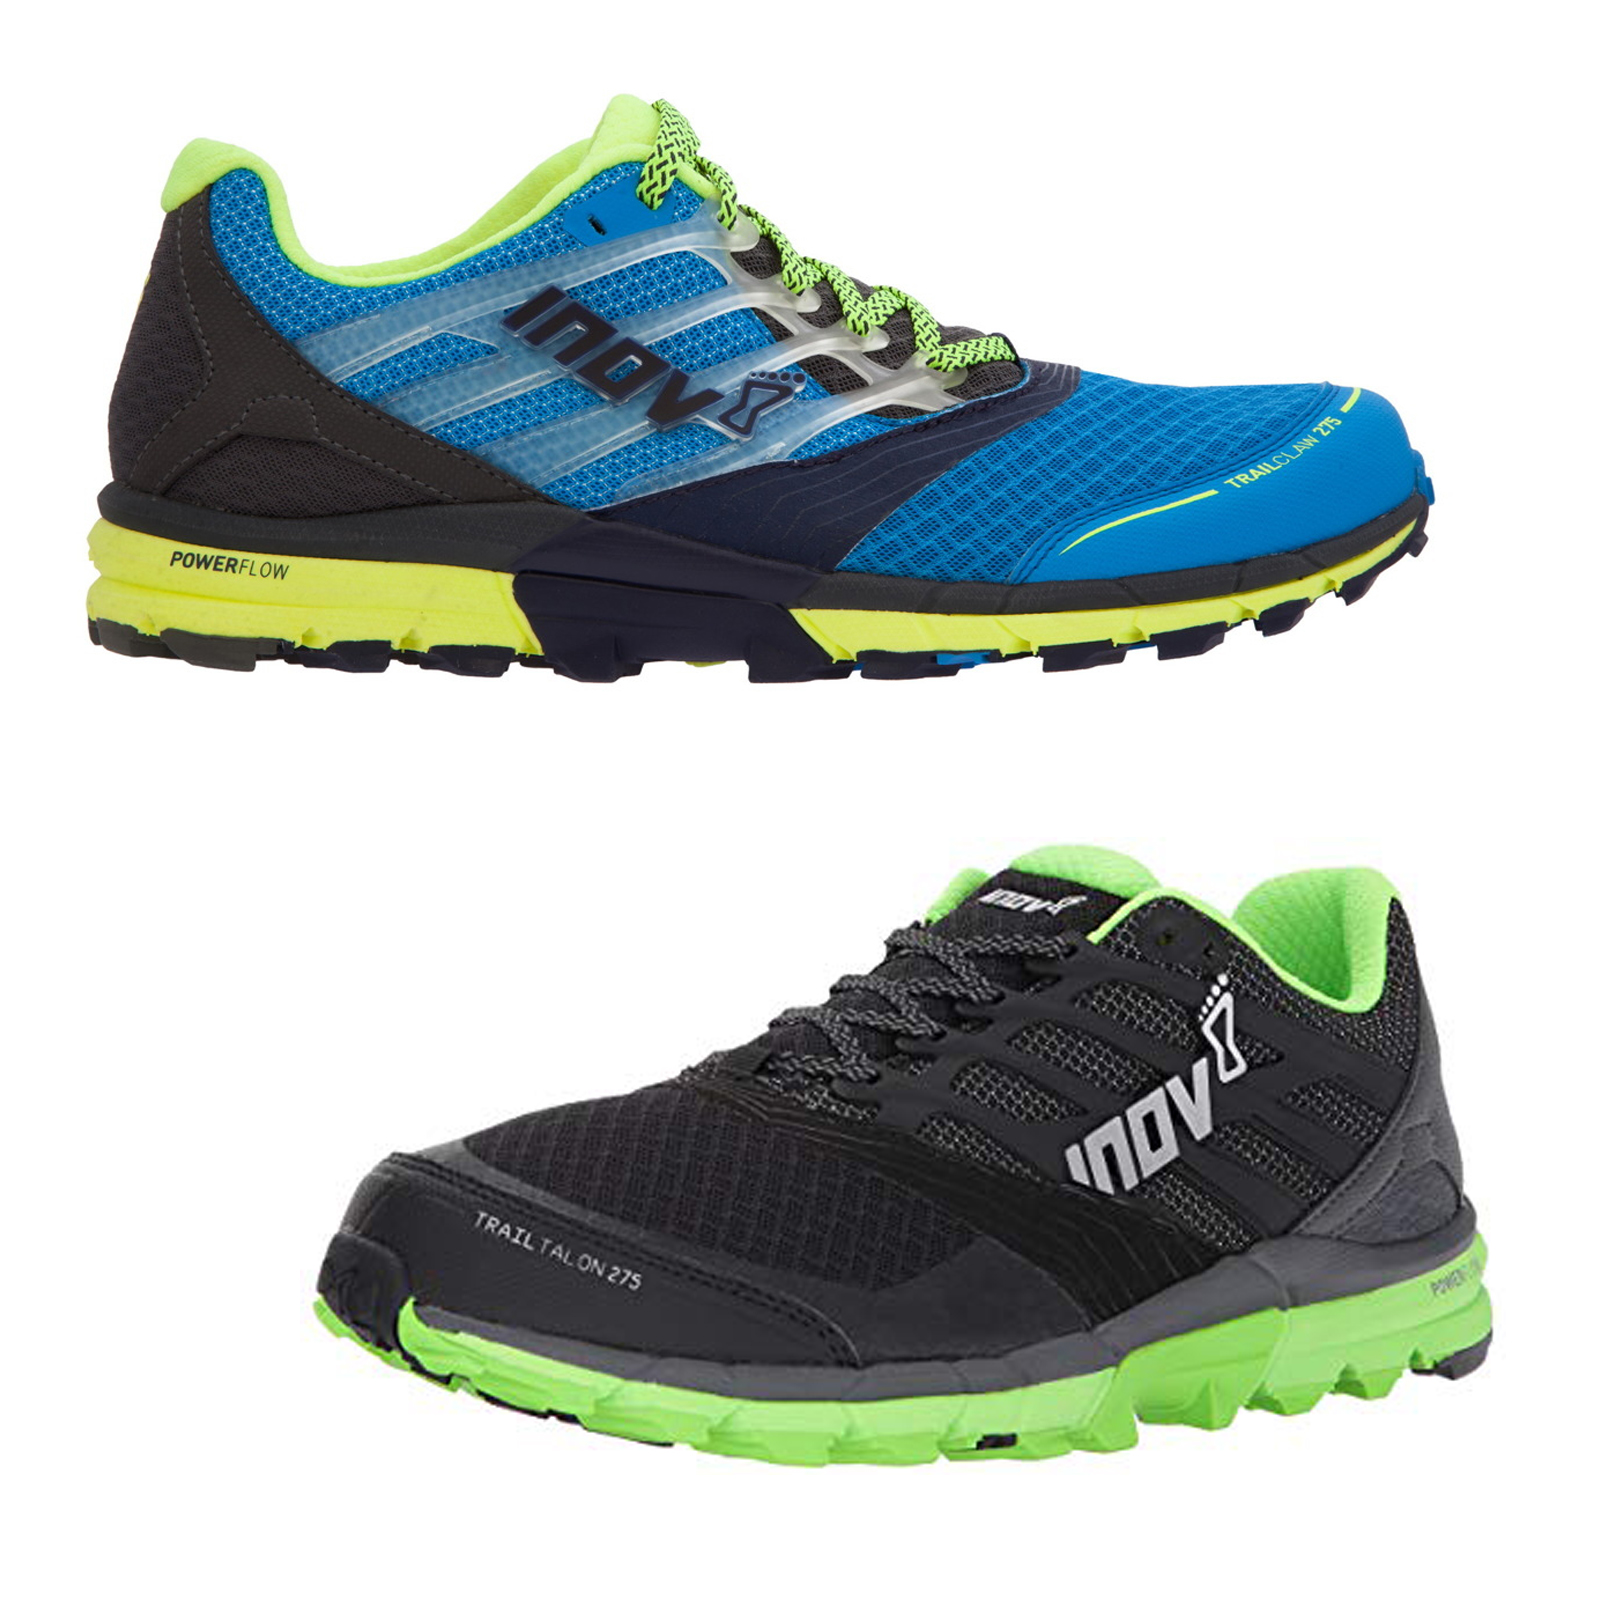 b21920bafba90 Details about Inov-8 Trailtalon 275 Mens Outdoor Path & Trail Terrain  Running Sneakers Shoes